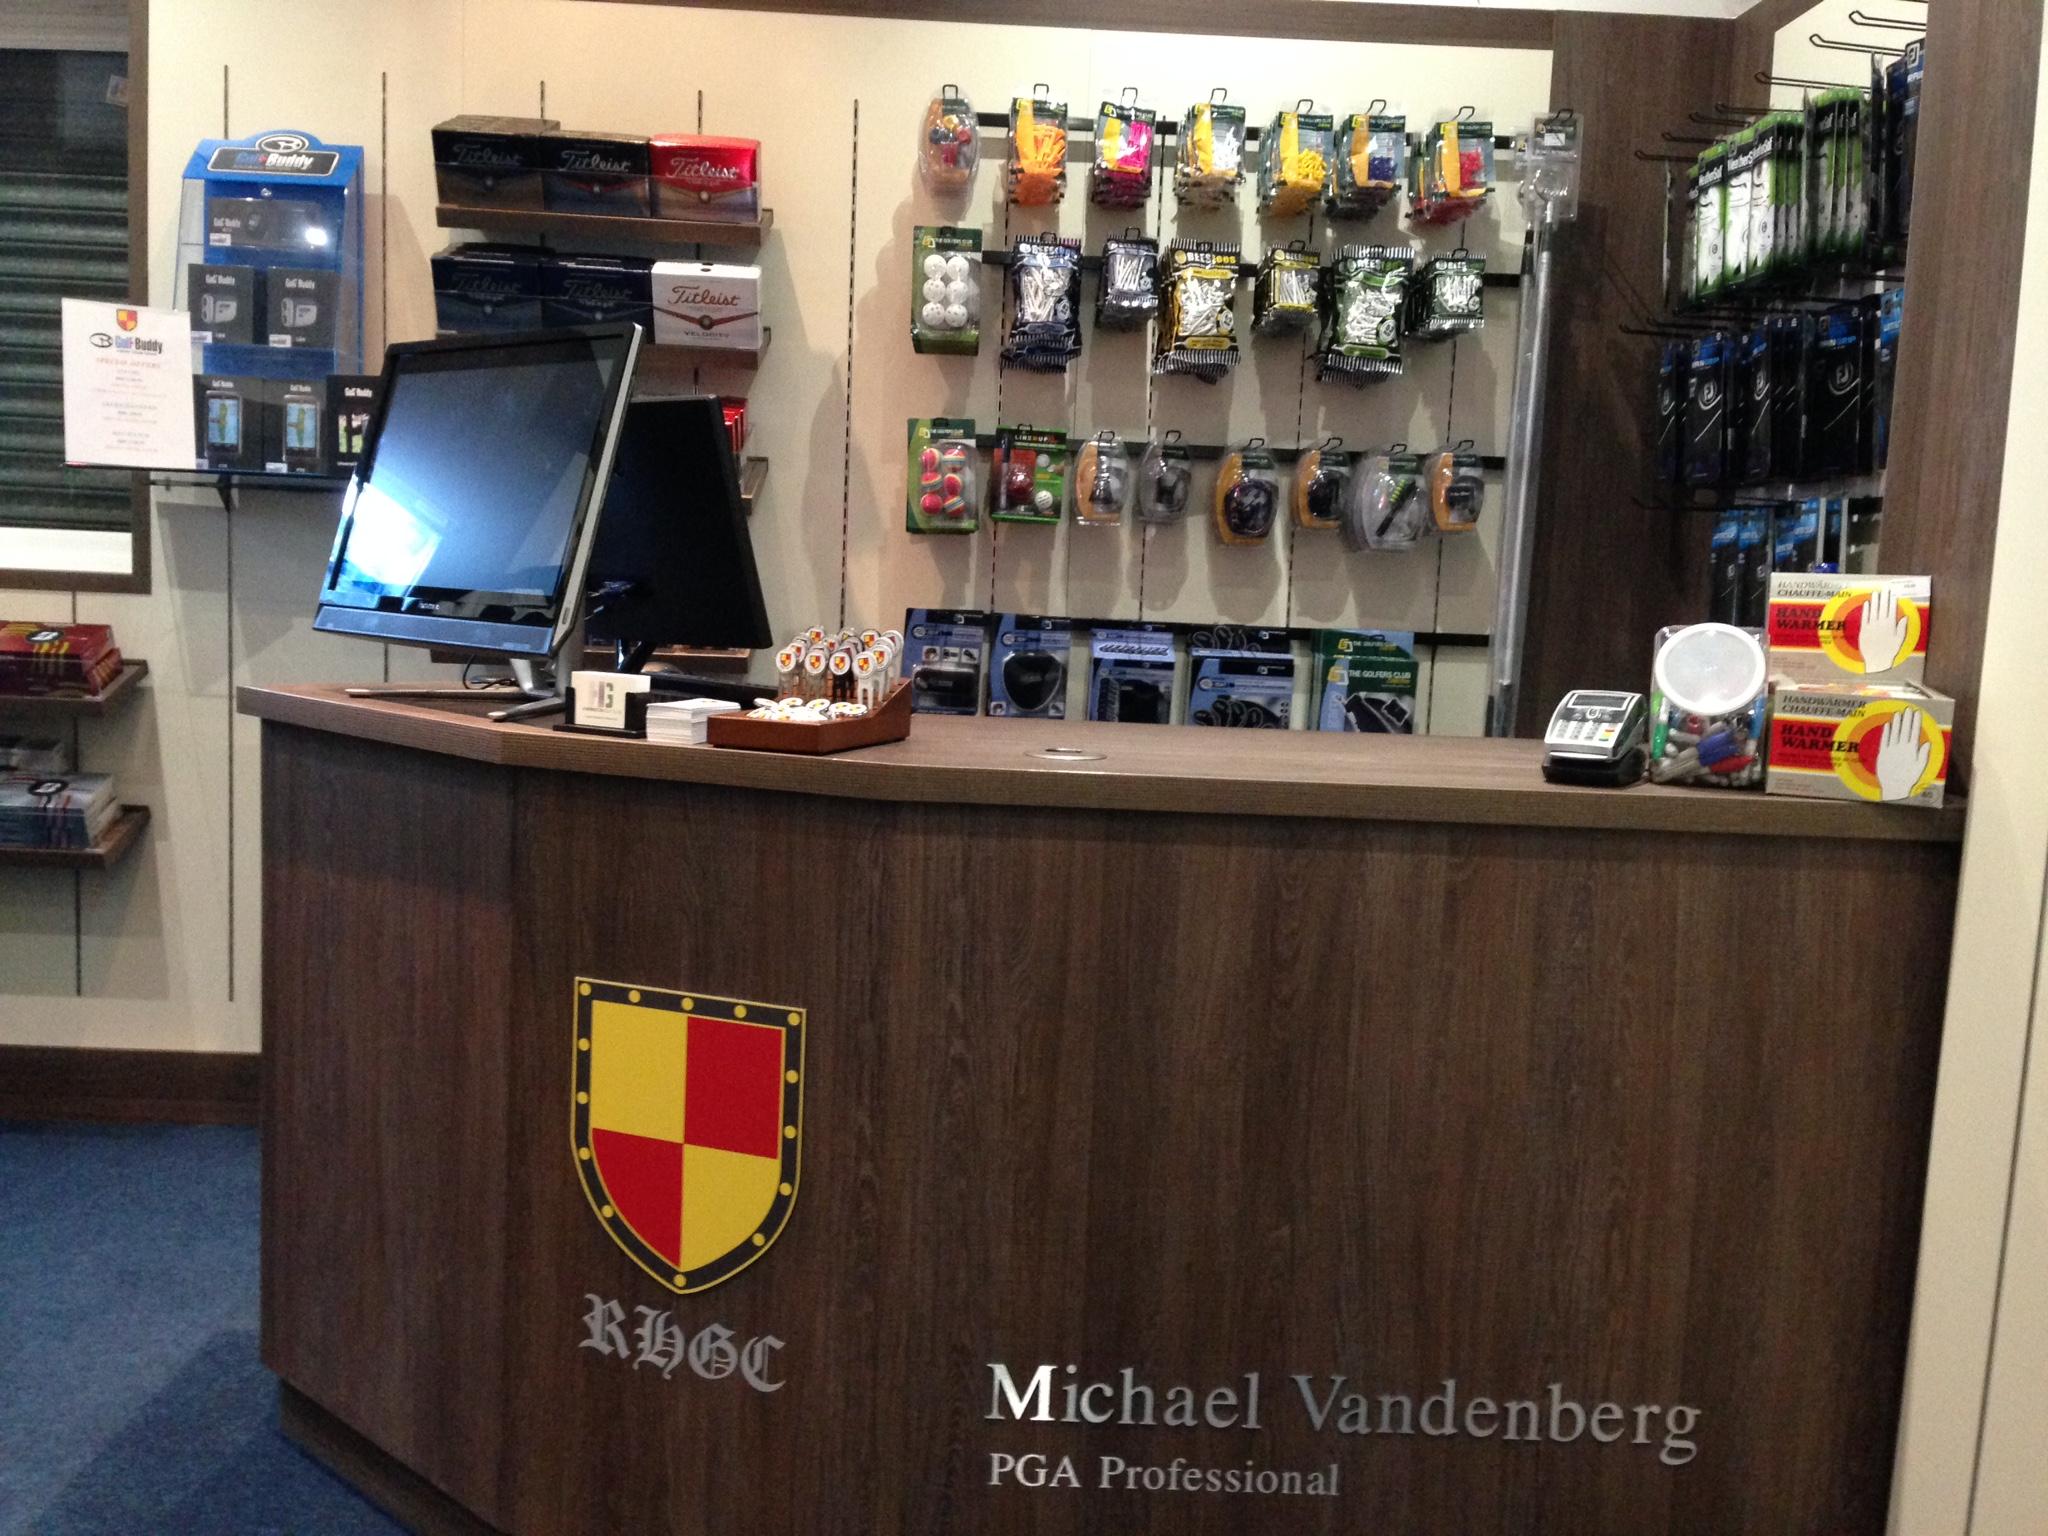 Vandenberg Golf